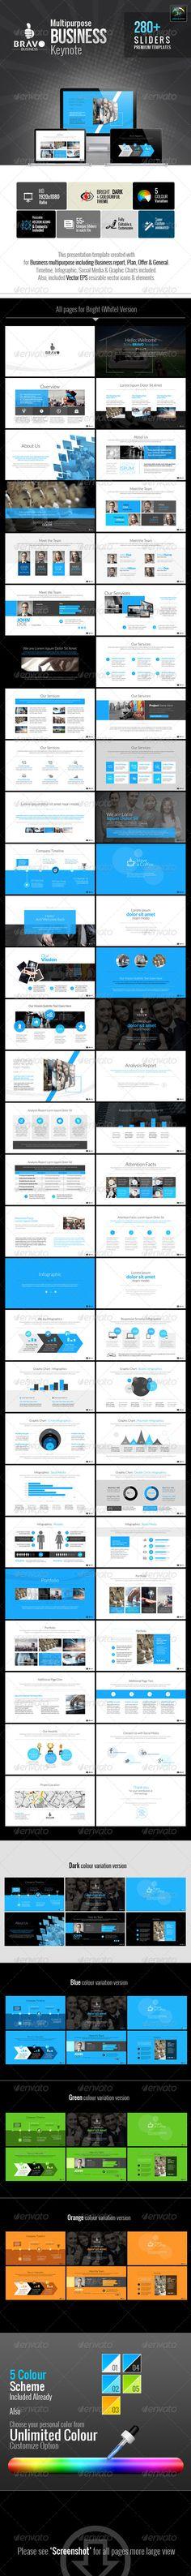 Bravo Multipurpose Business Keynote | Keynote theme / template